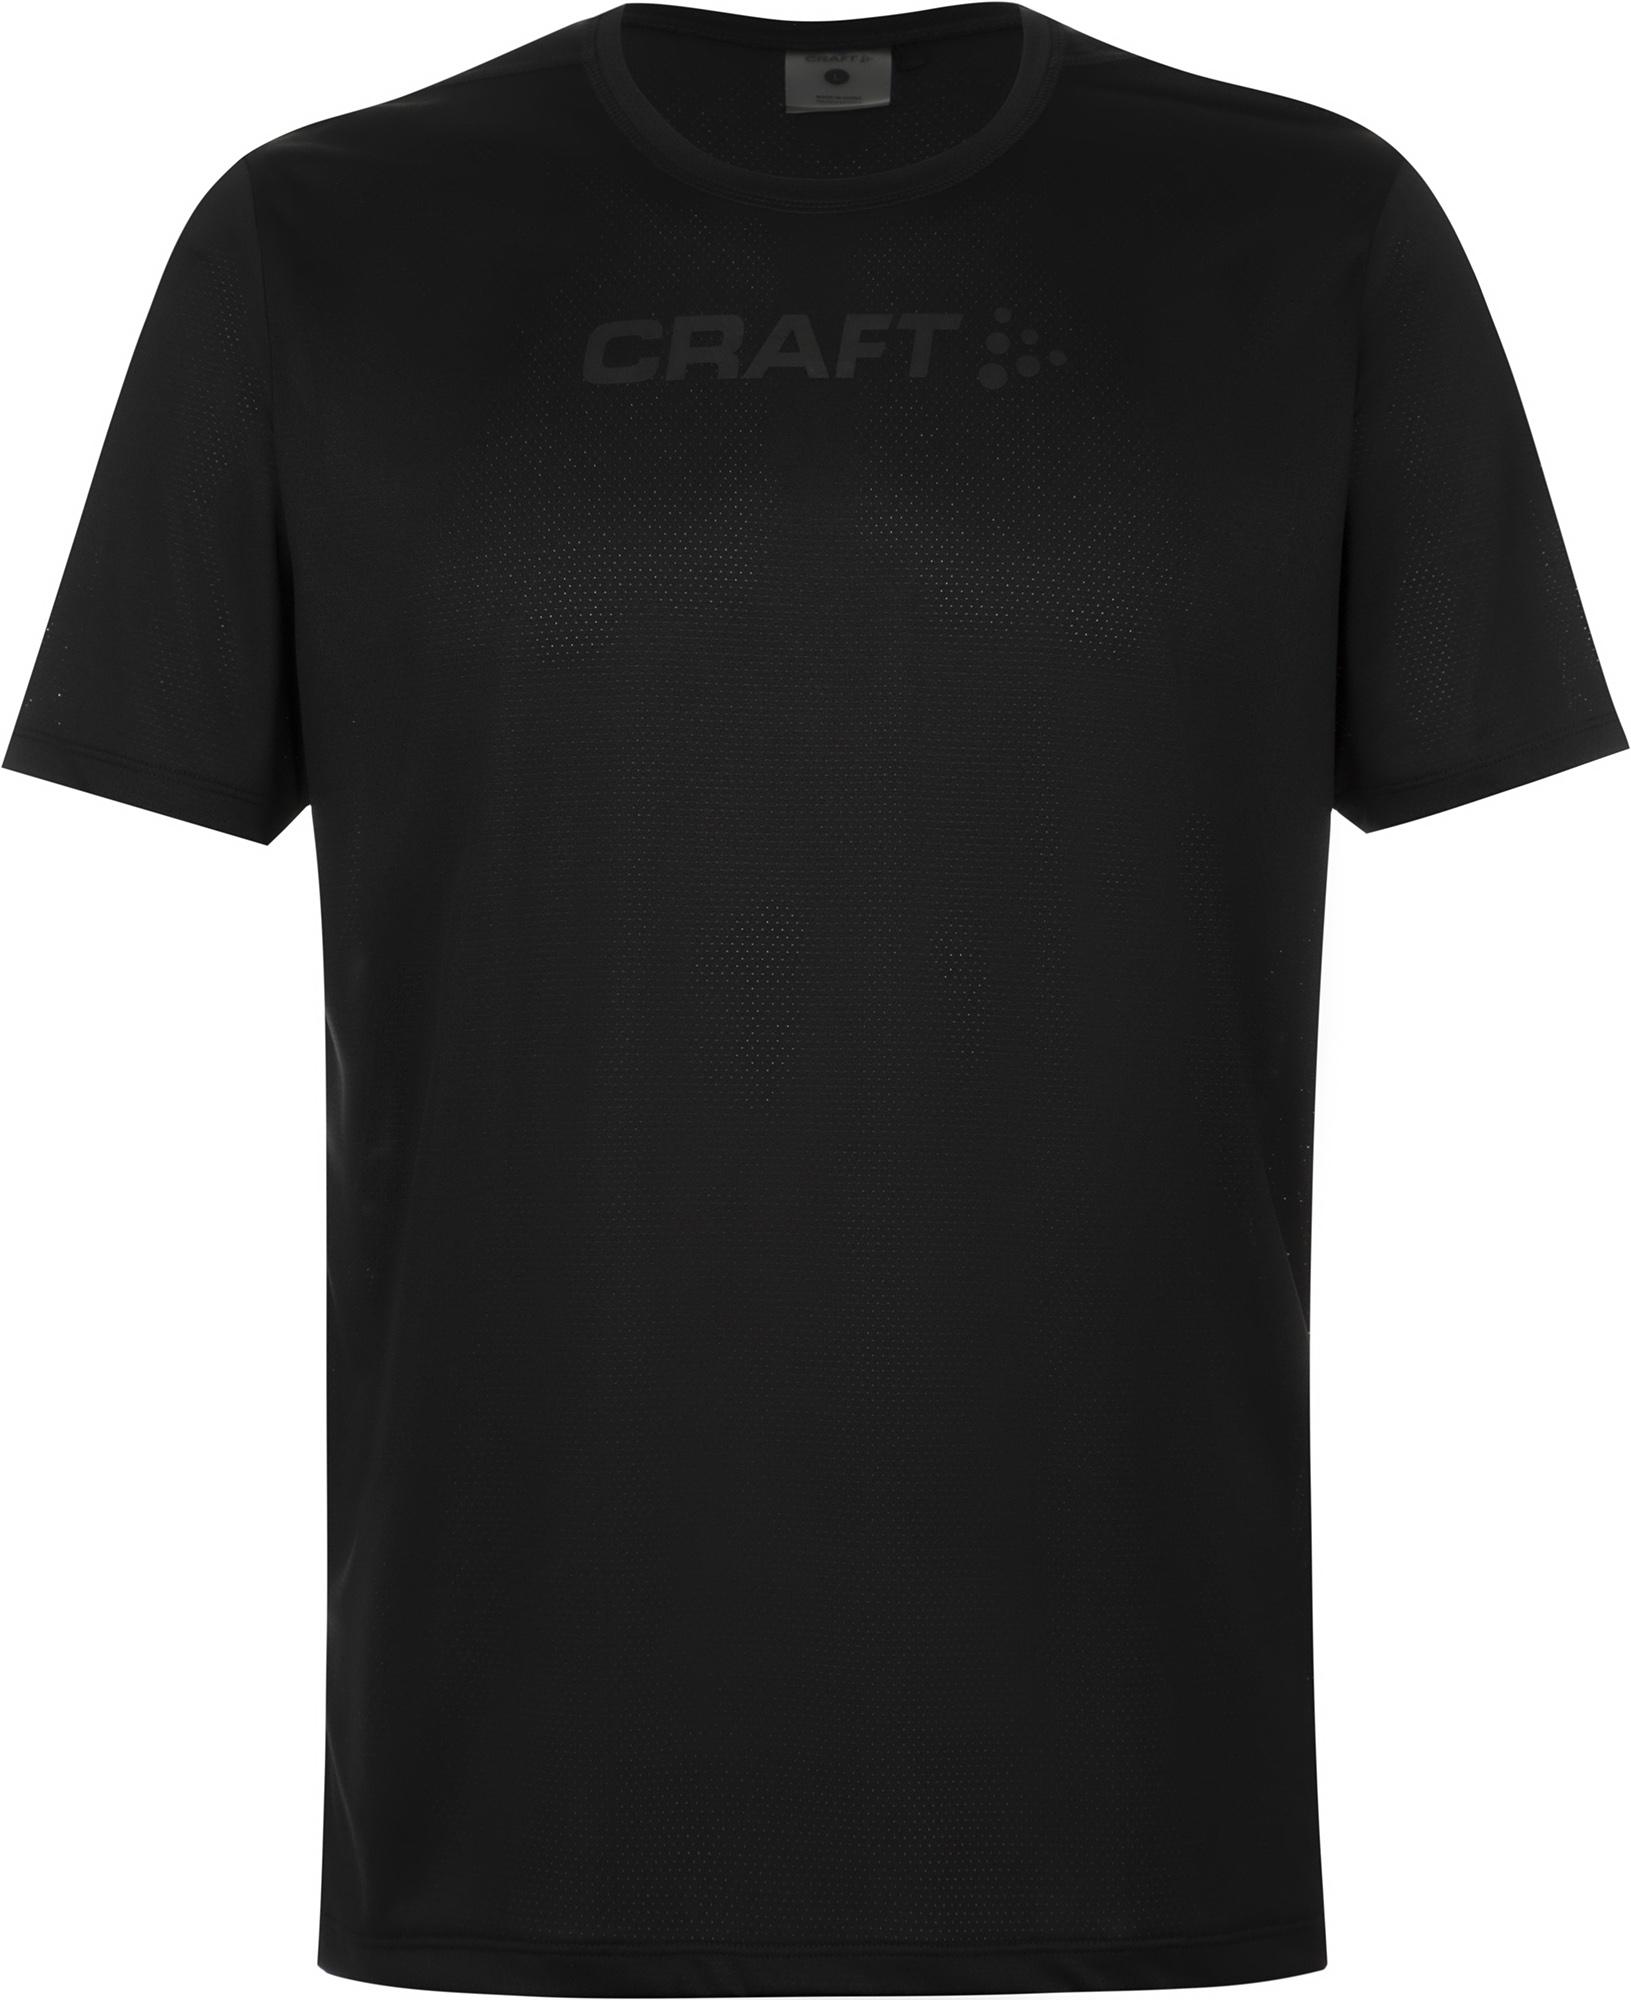 Фото - Craft Футболка мужская Craft Core Essence, размер 52-54 craft куртка мужская craft размер 52